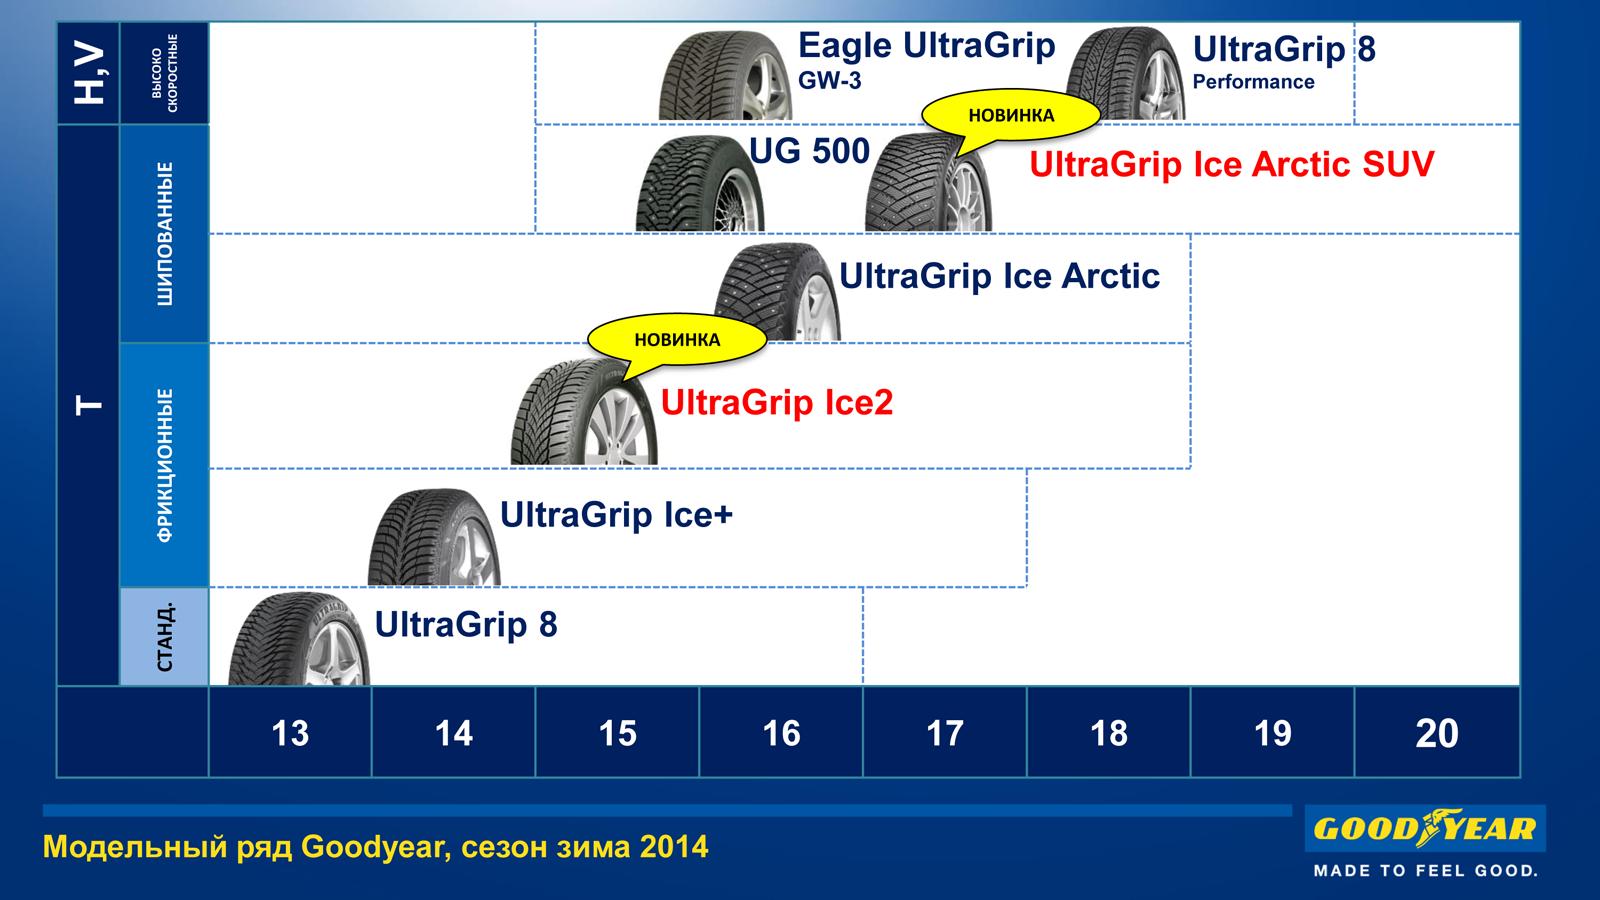 no_copyright_ line UGIce 2и UGIce Arctic SUV 8t